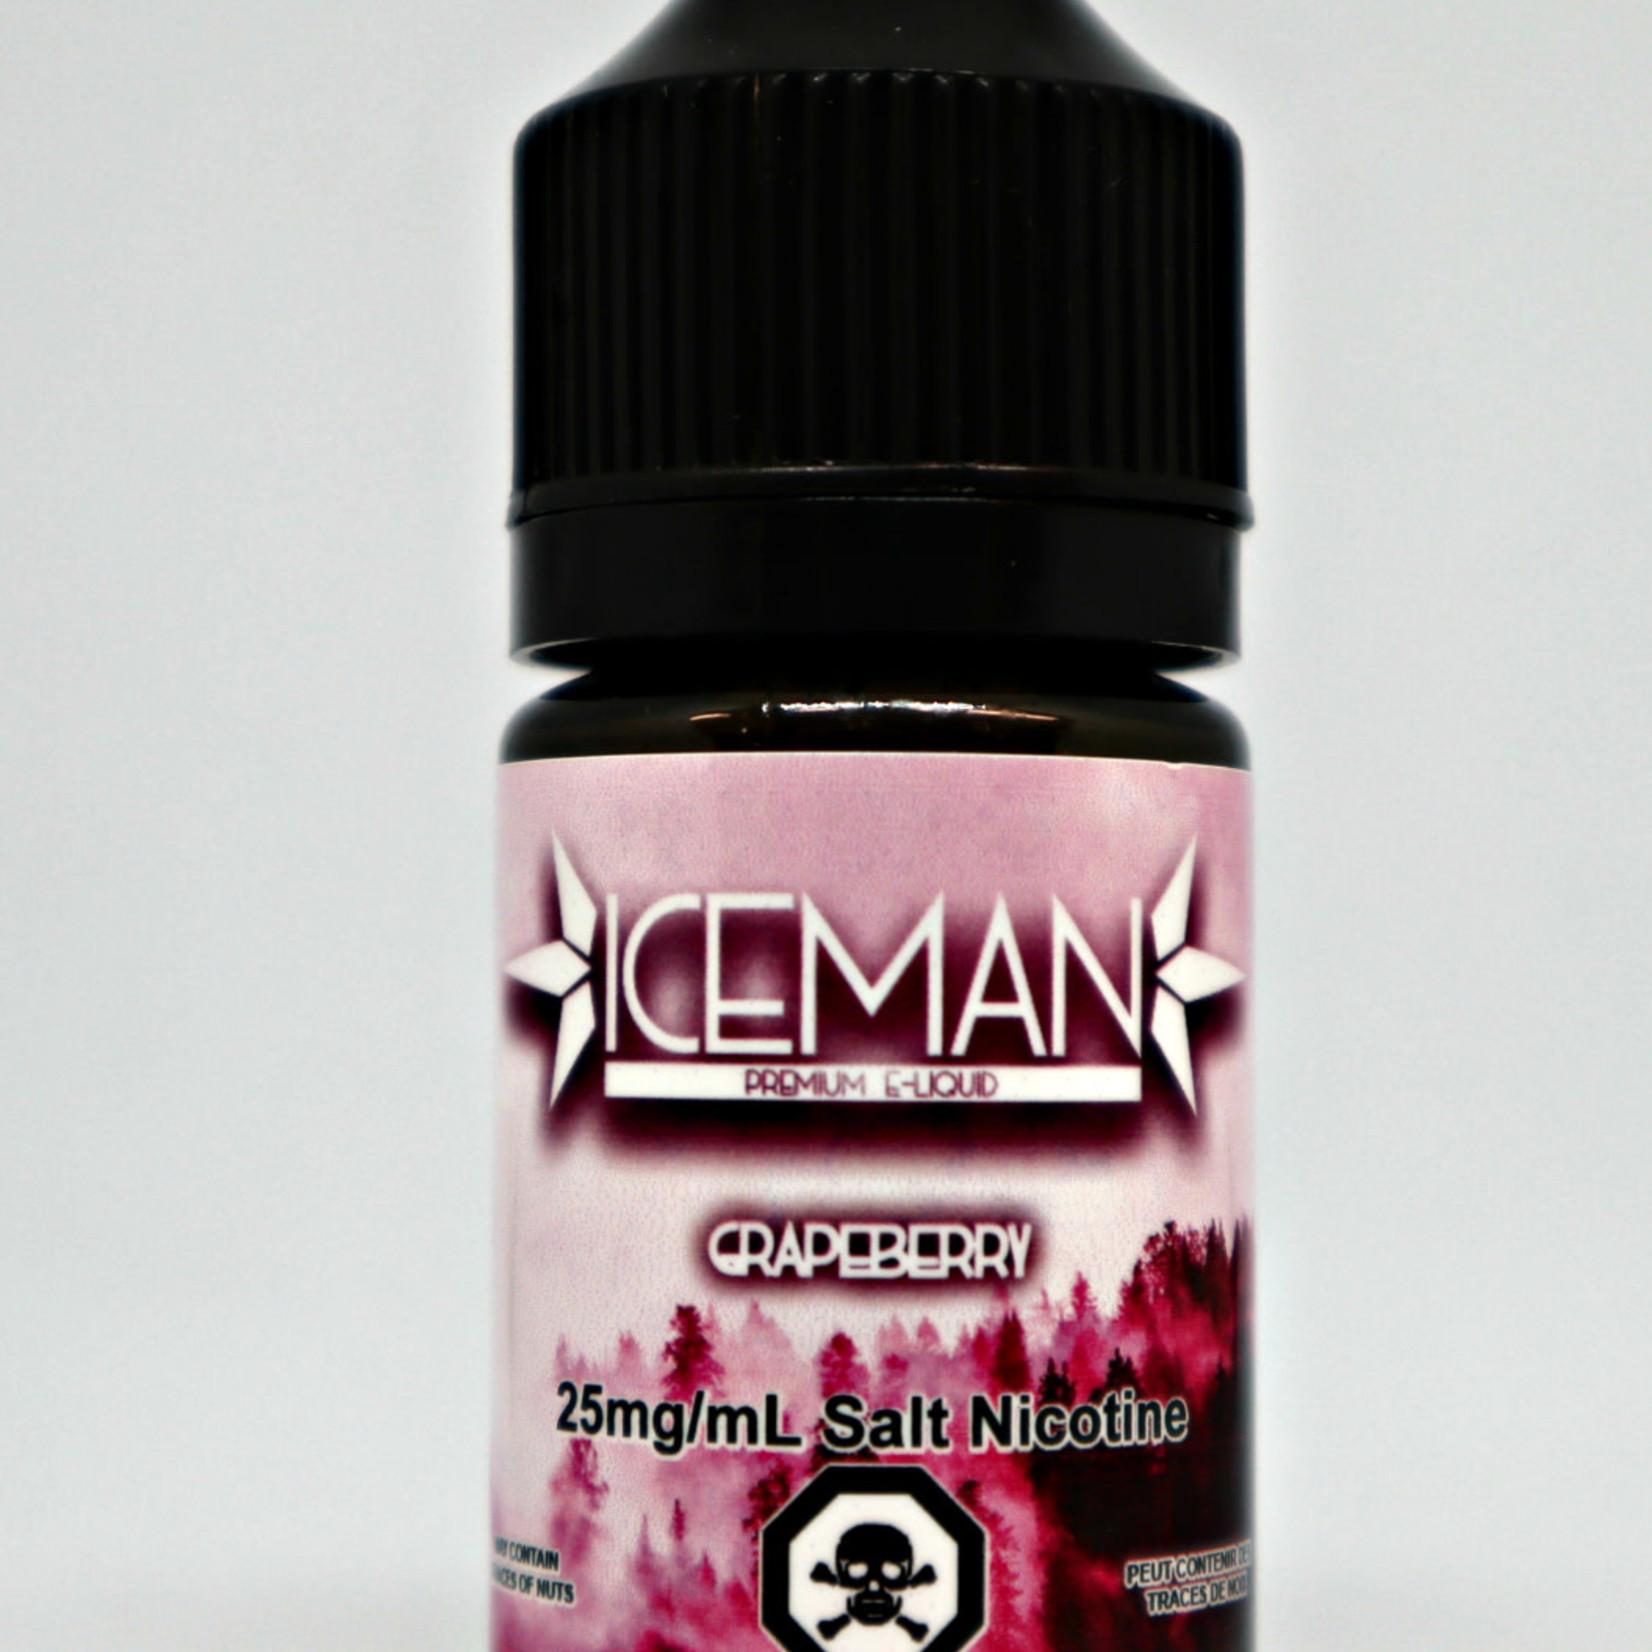 Iceman Grapeberry Salt